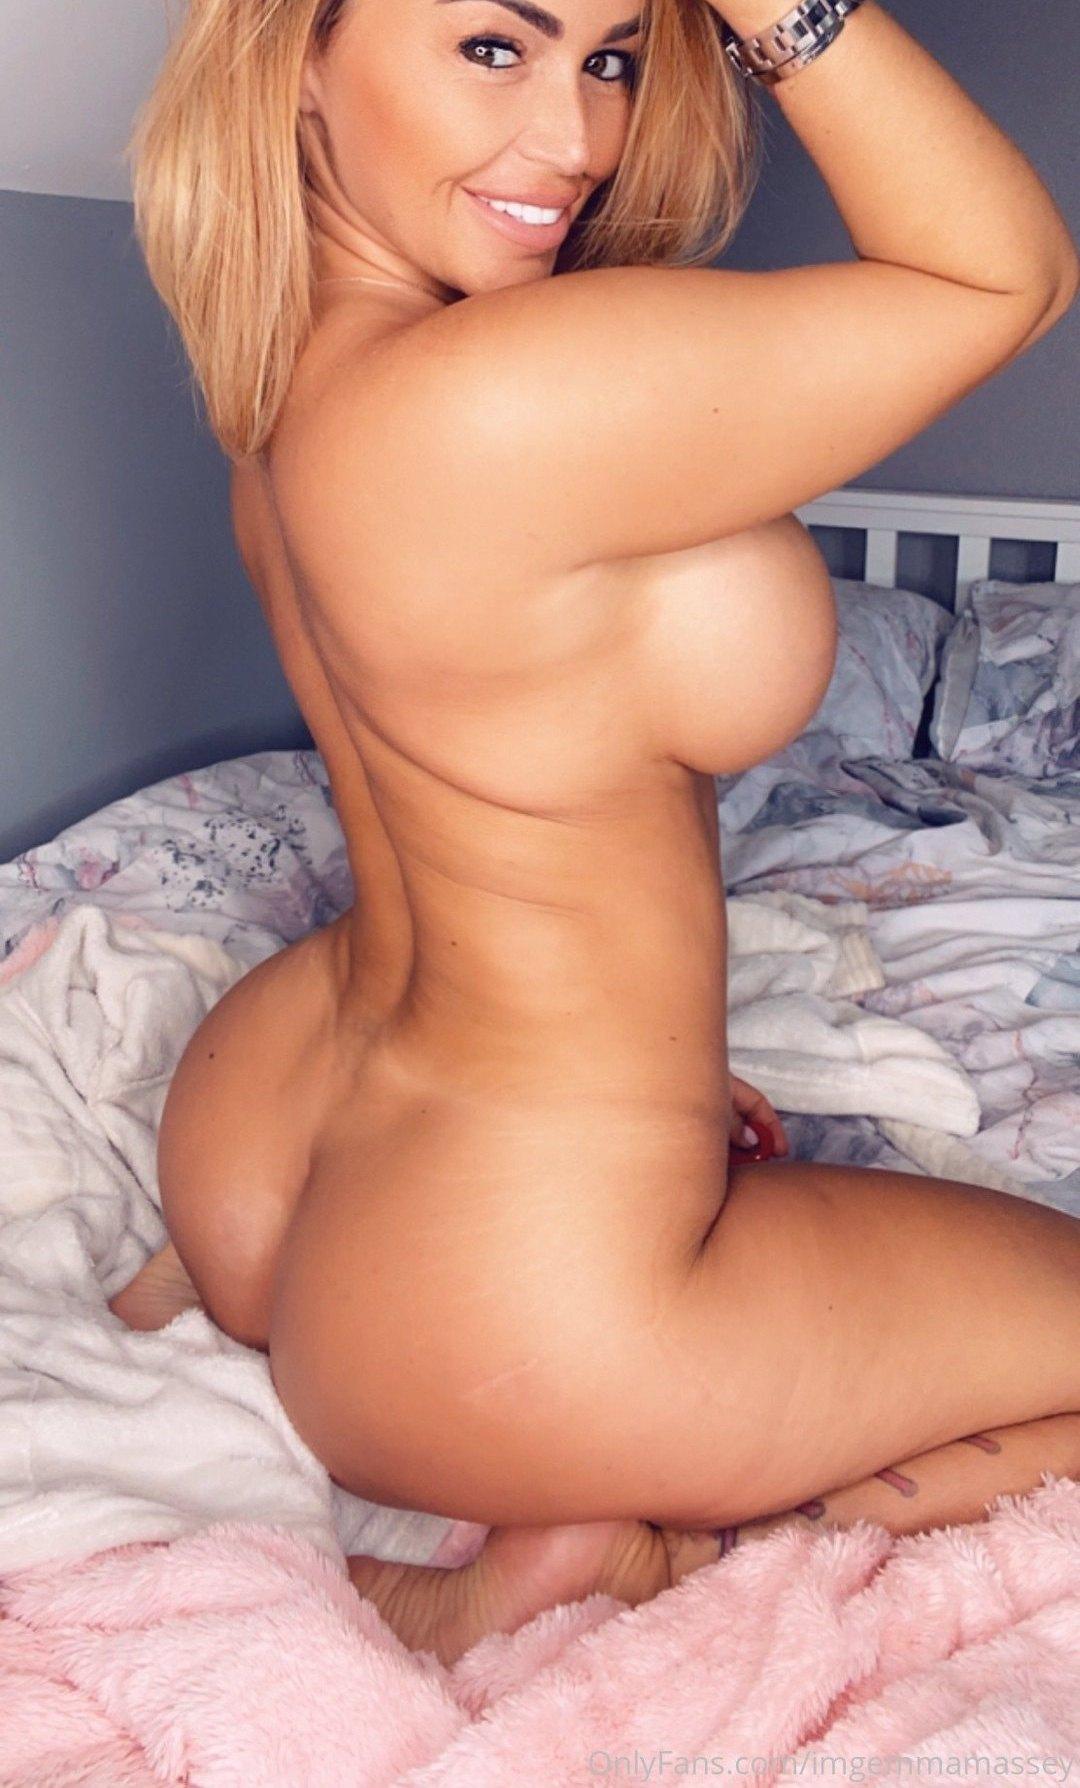 Gemma Massey Imgemmamassey Onlyfans Nudes Leaks 0017